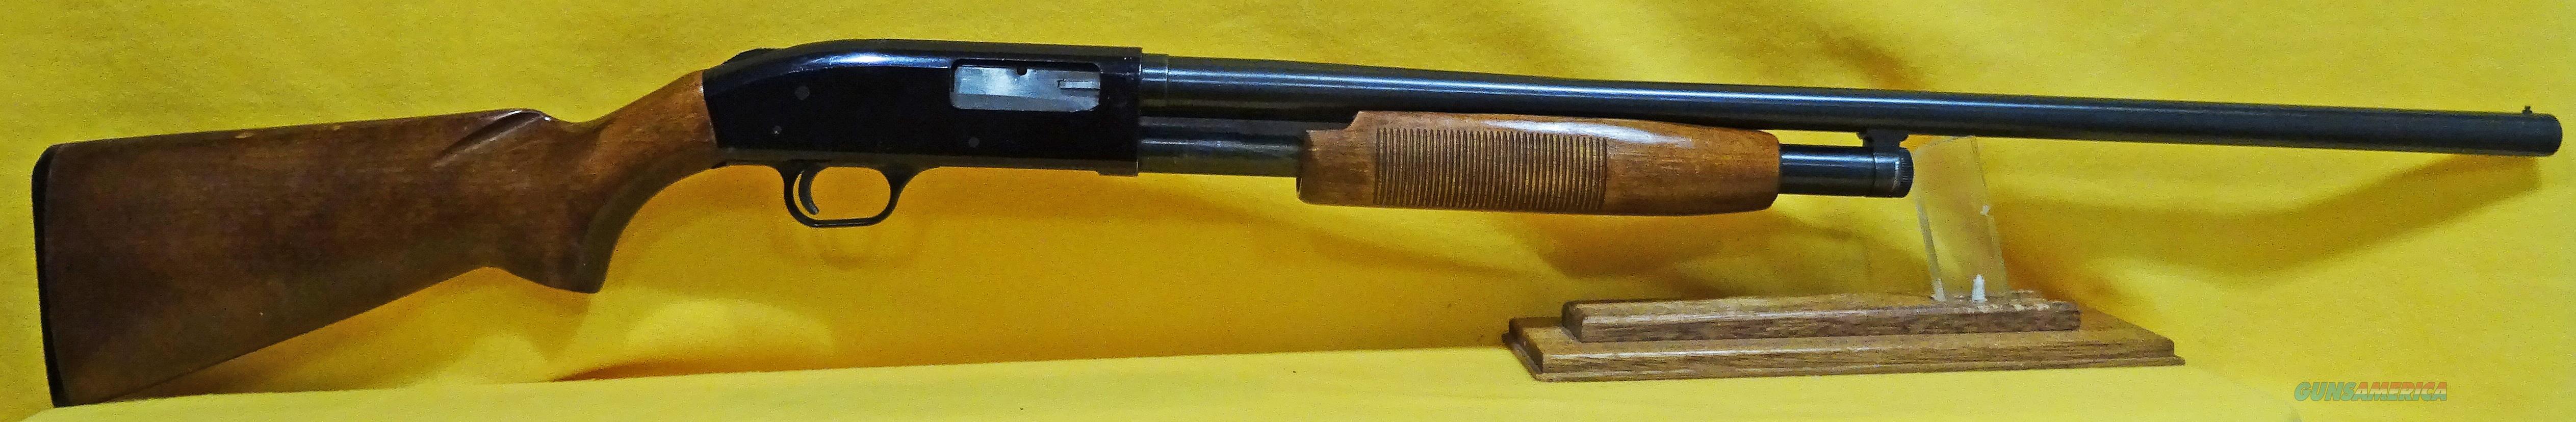 MOSSBERG 500AT  Guns > Shotguns > Mossberg Shotguns > Pump > Sporting